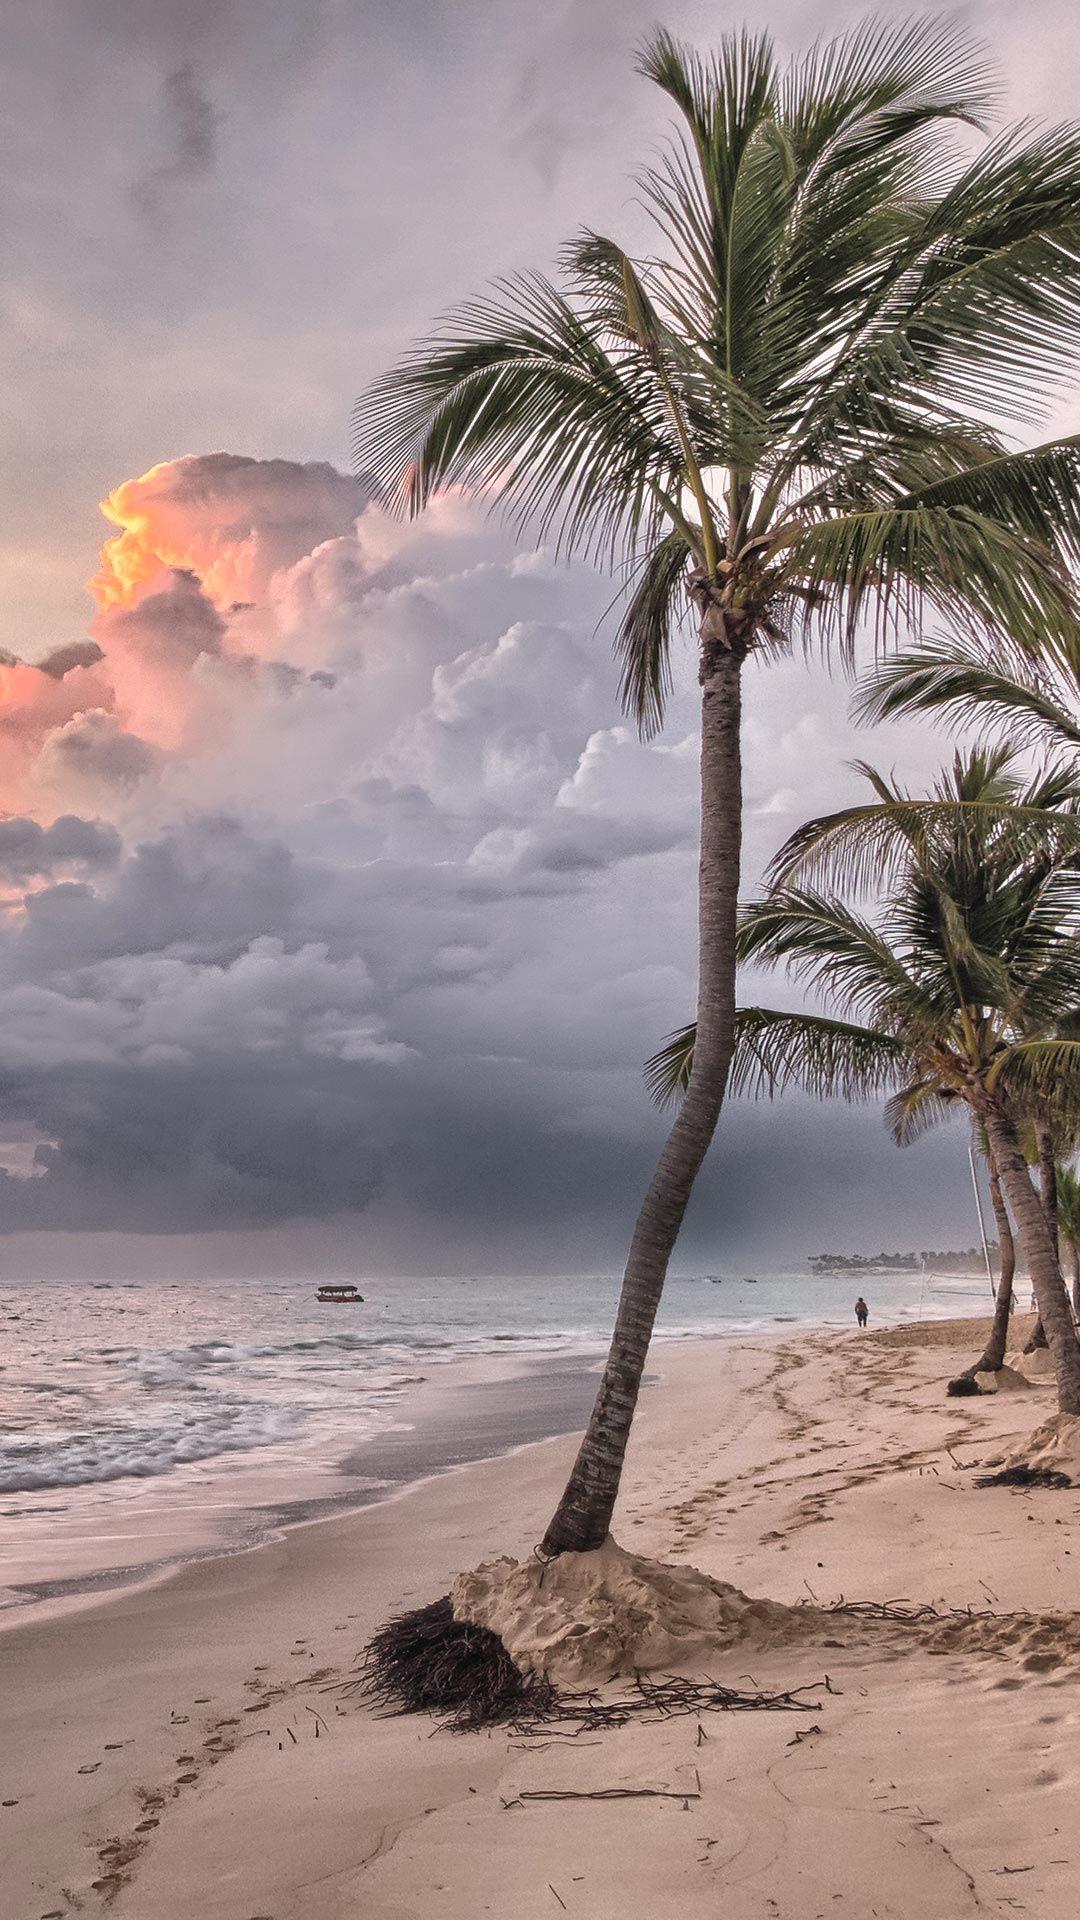 50 Beautiful Beach Wallpaper Phone Backgrounds Hd For Free Download Beach Wallpaper Beach Phone Wallpaper Tropical Paradise Beach